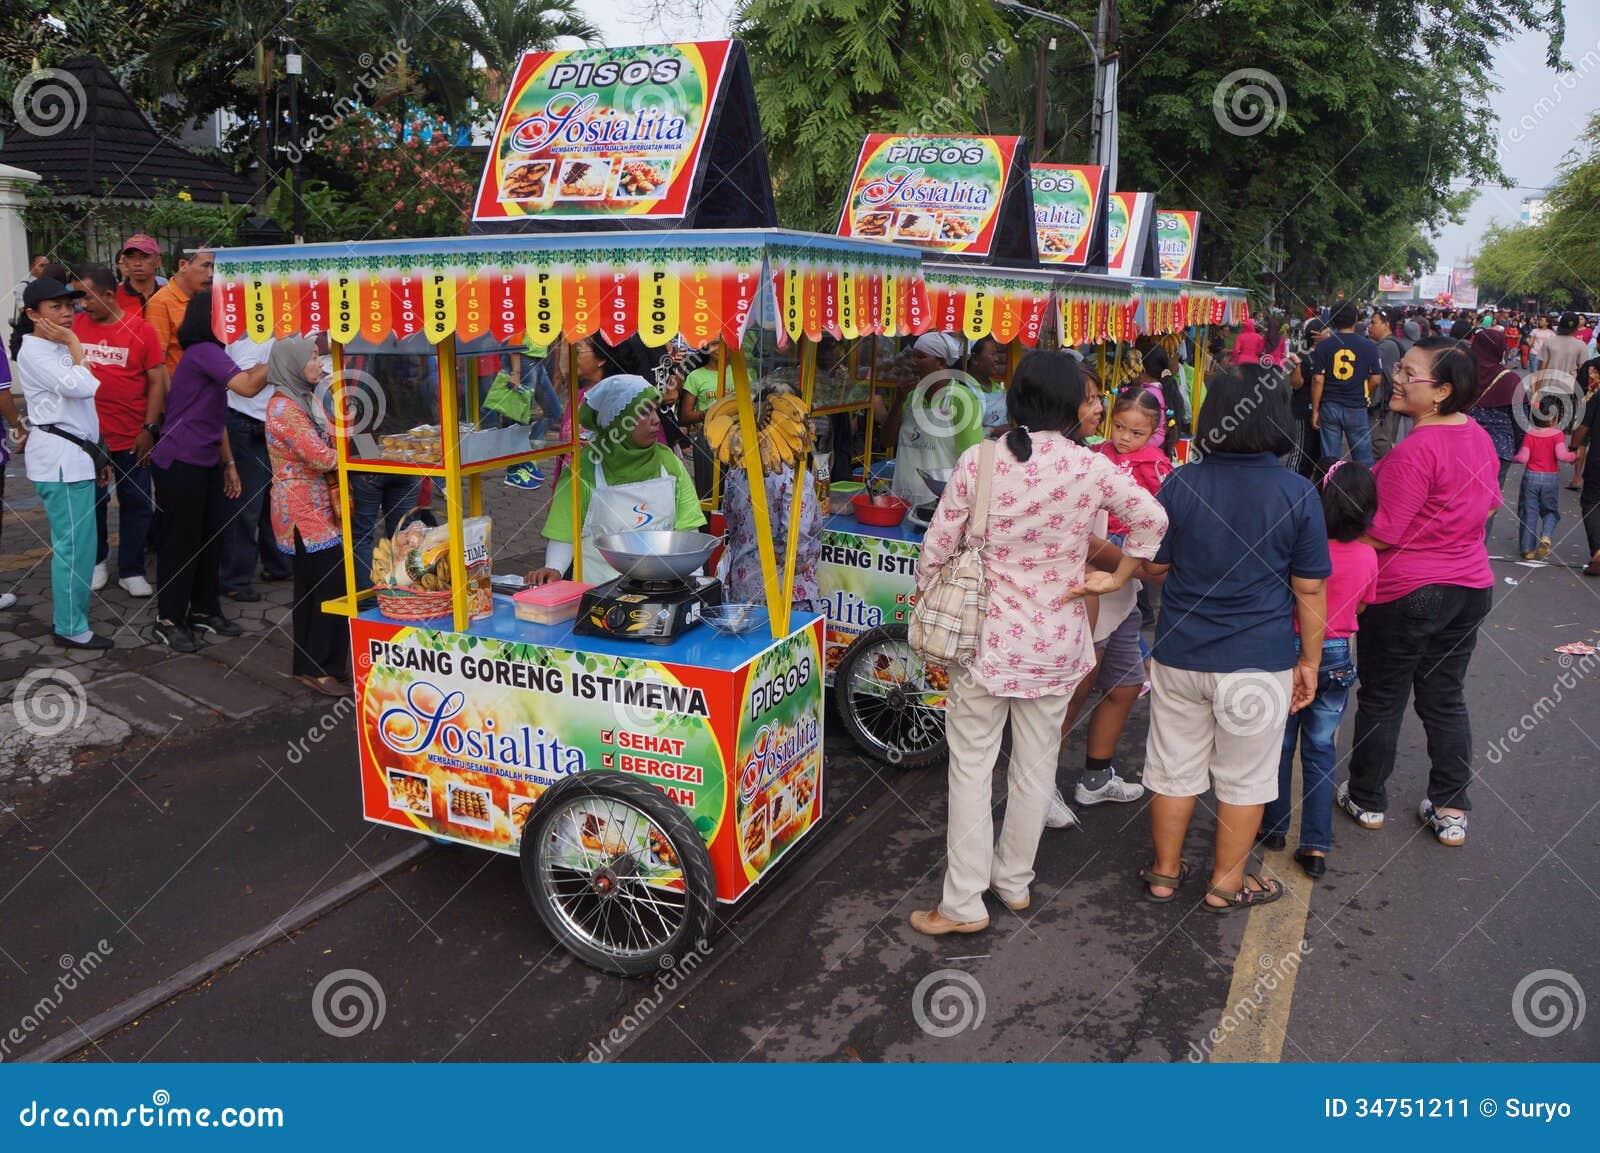 street food vendor business plan